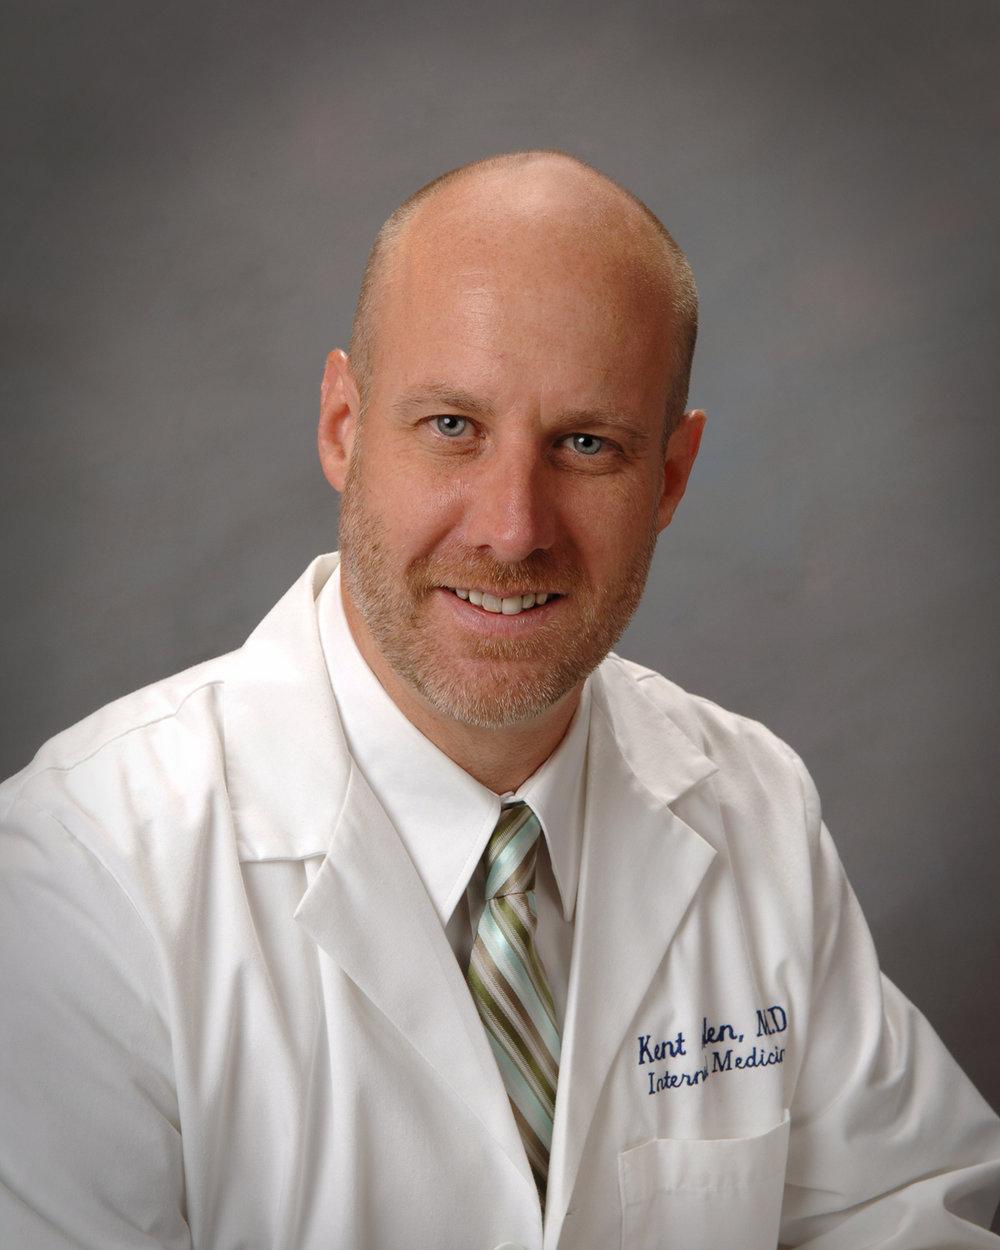 Dr. Kent Allen